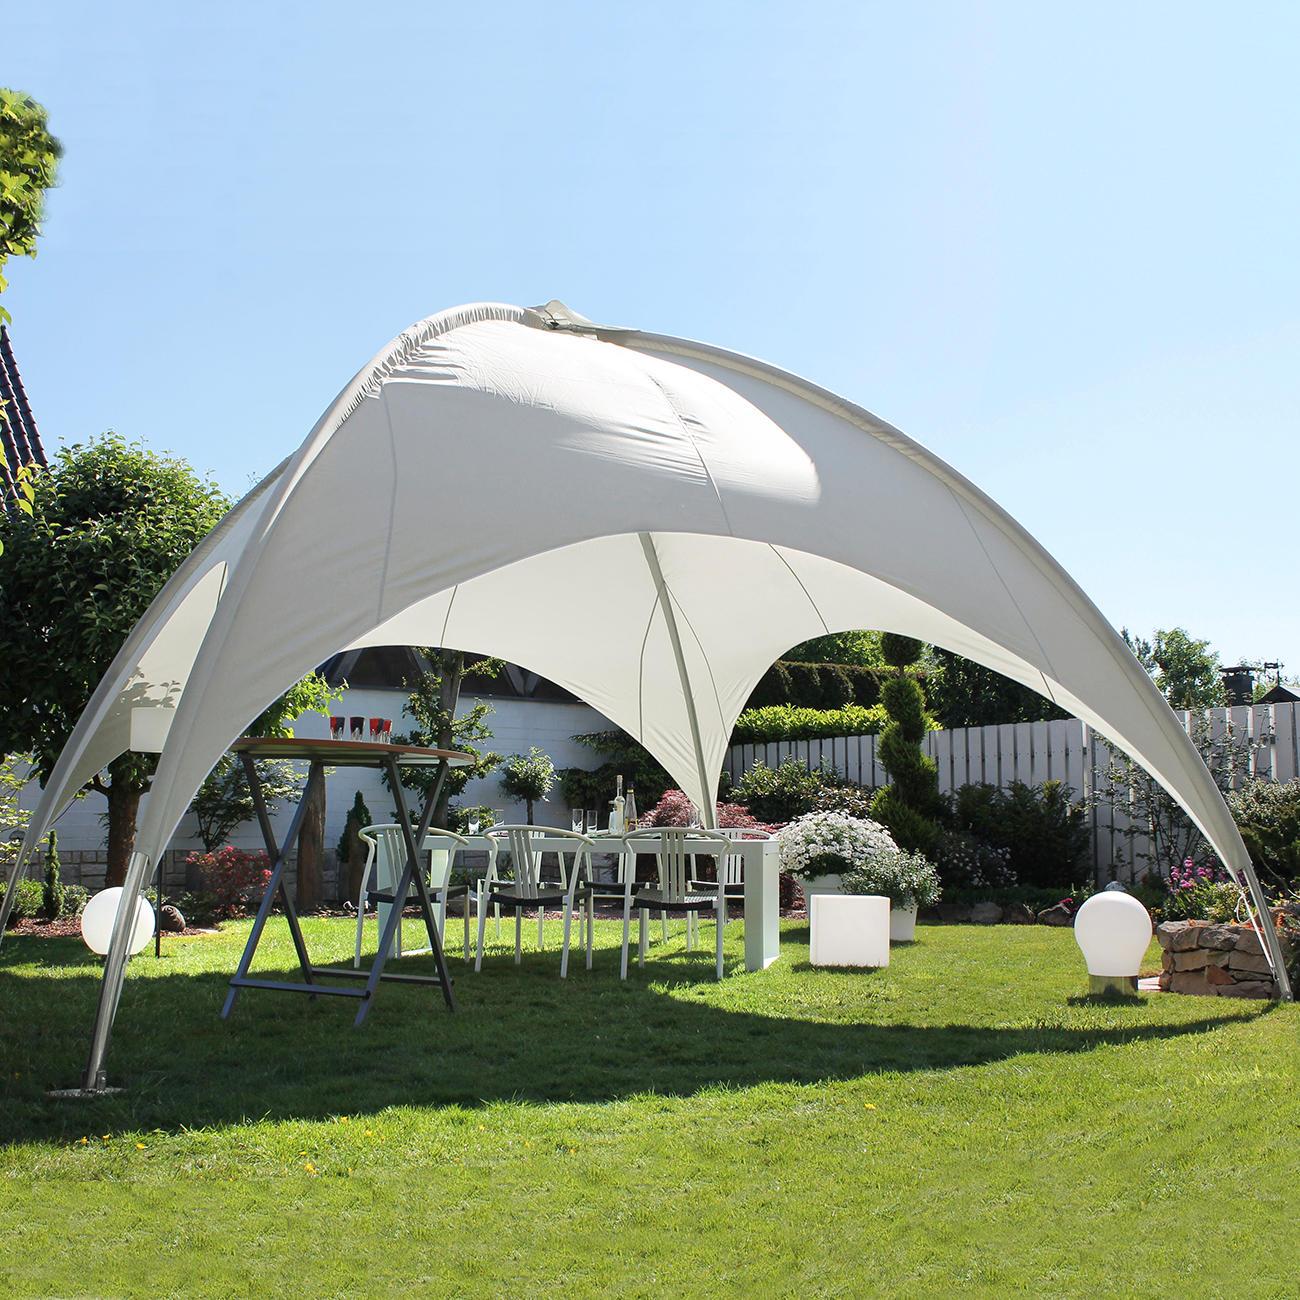 19 m kuppelpavillon 3 jahre garantie pro idee. Black Bedroom Furniture Sets. Home Design Ideas